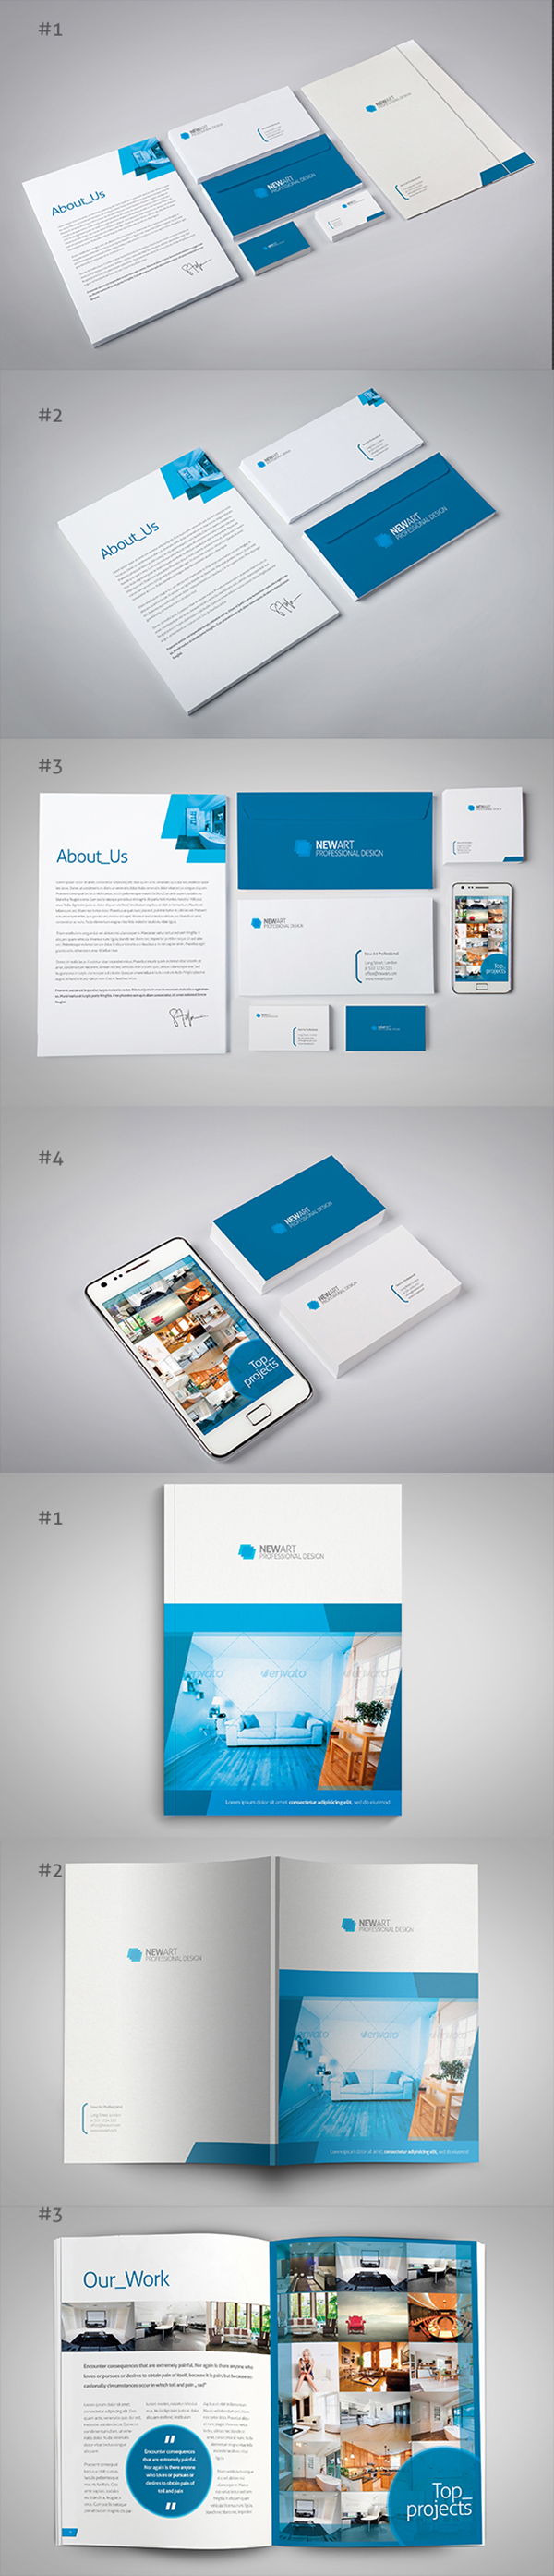 03 Branding : Identity Mockup